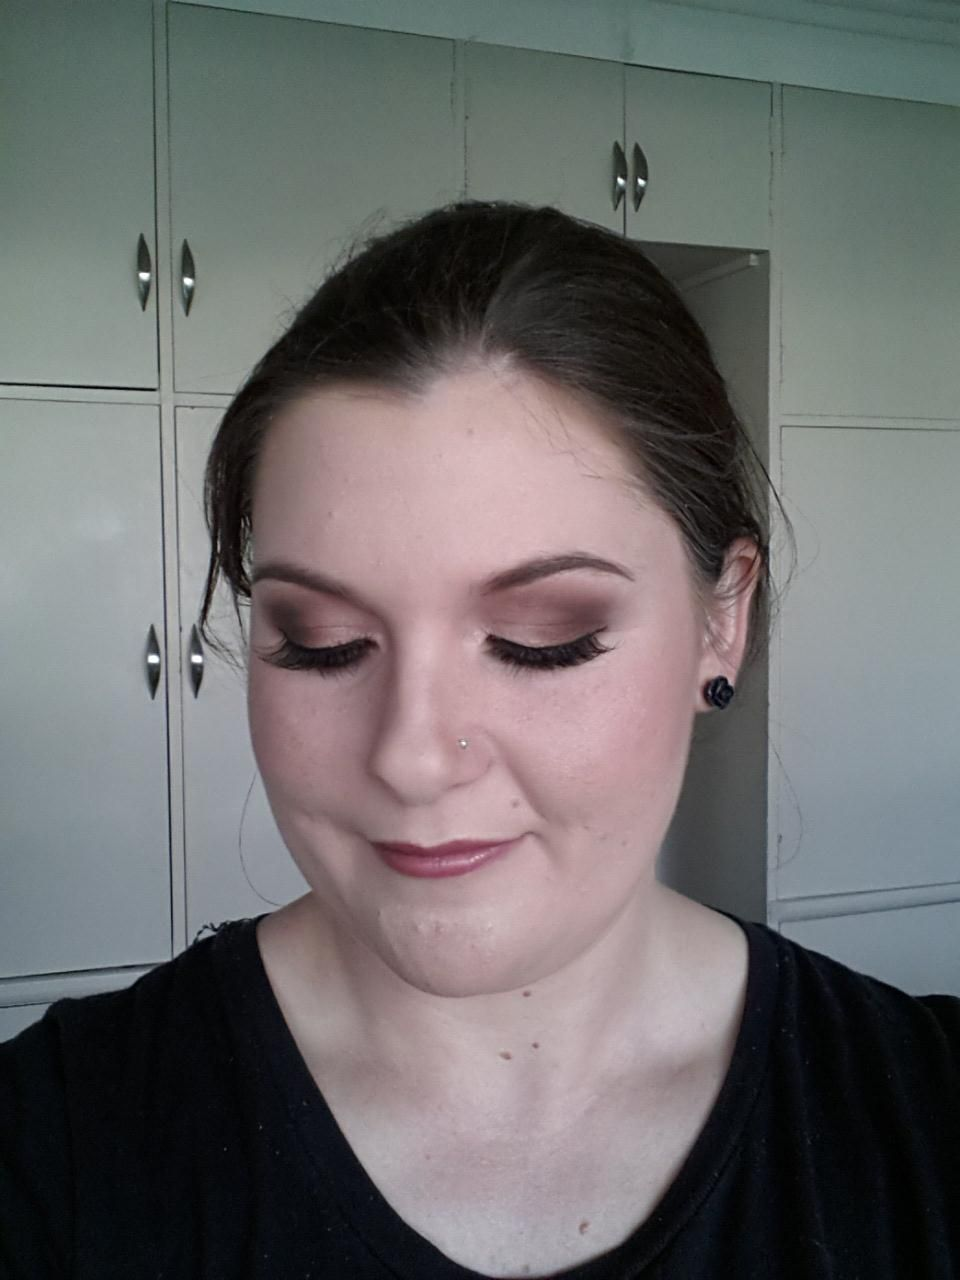 My makeup trial by janet rowe in nz wedding planning pinterest